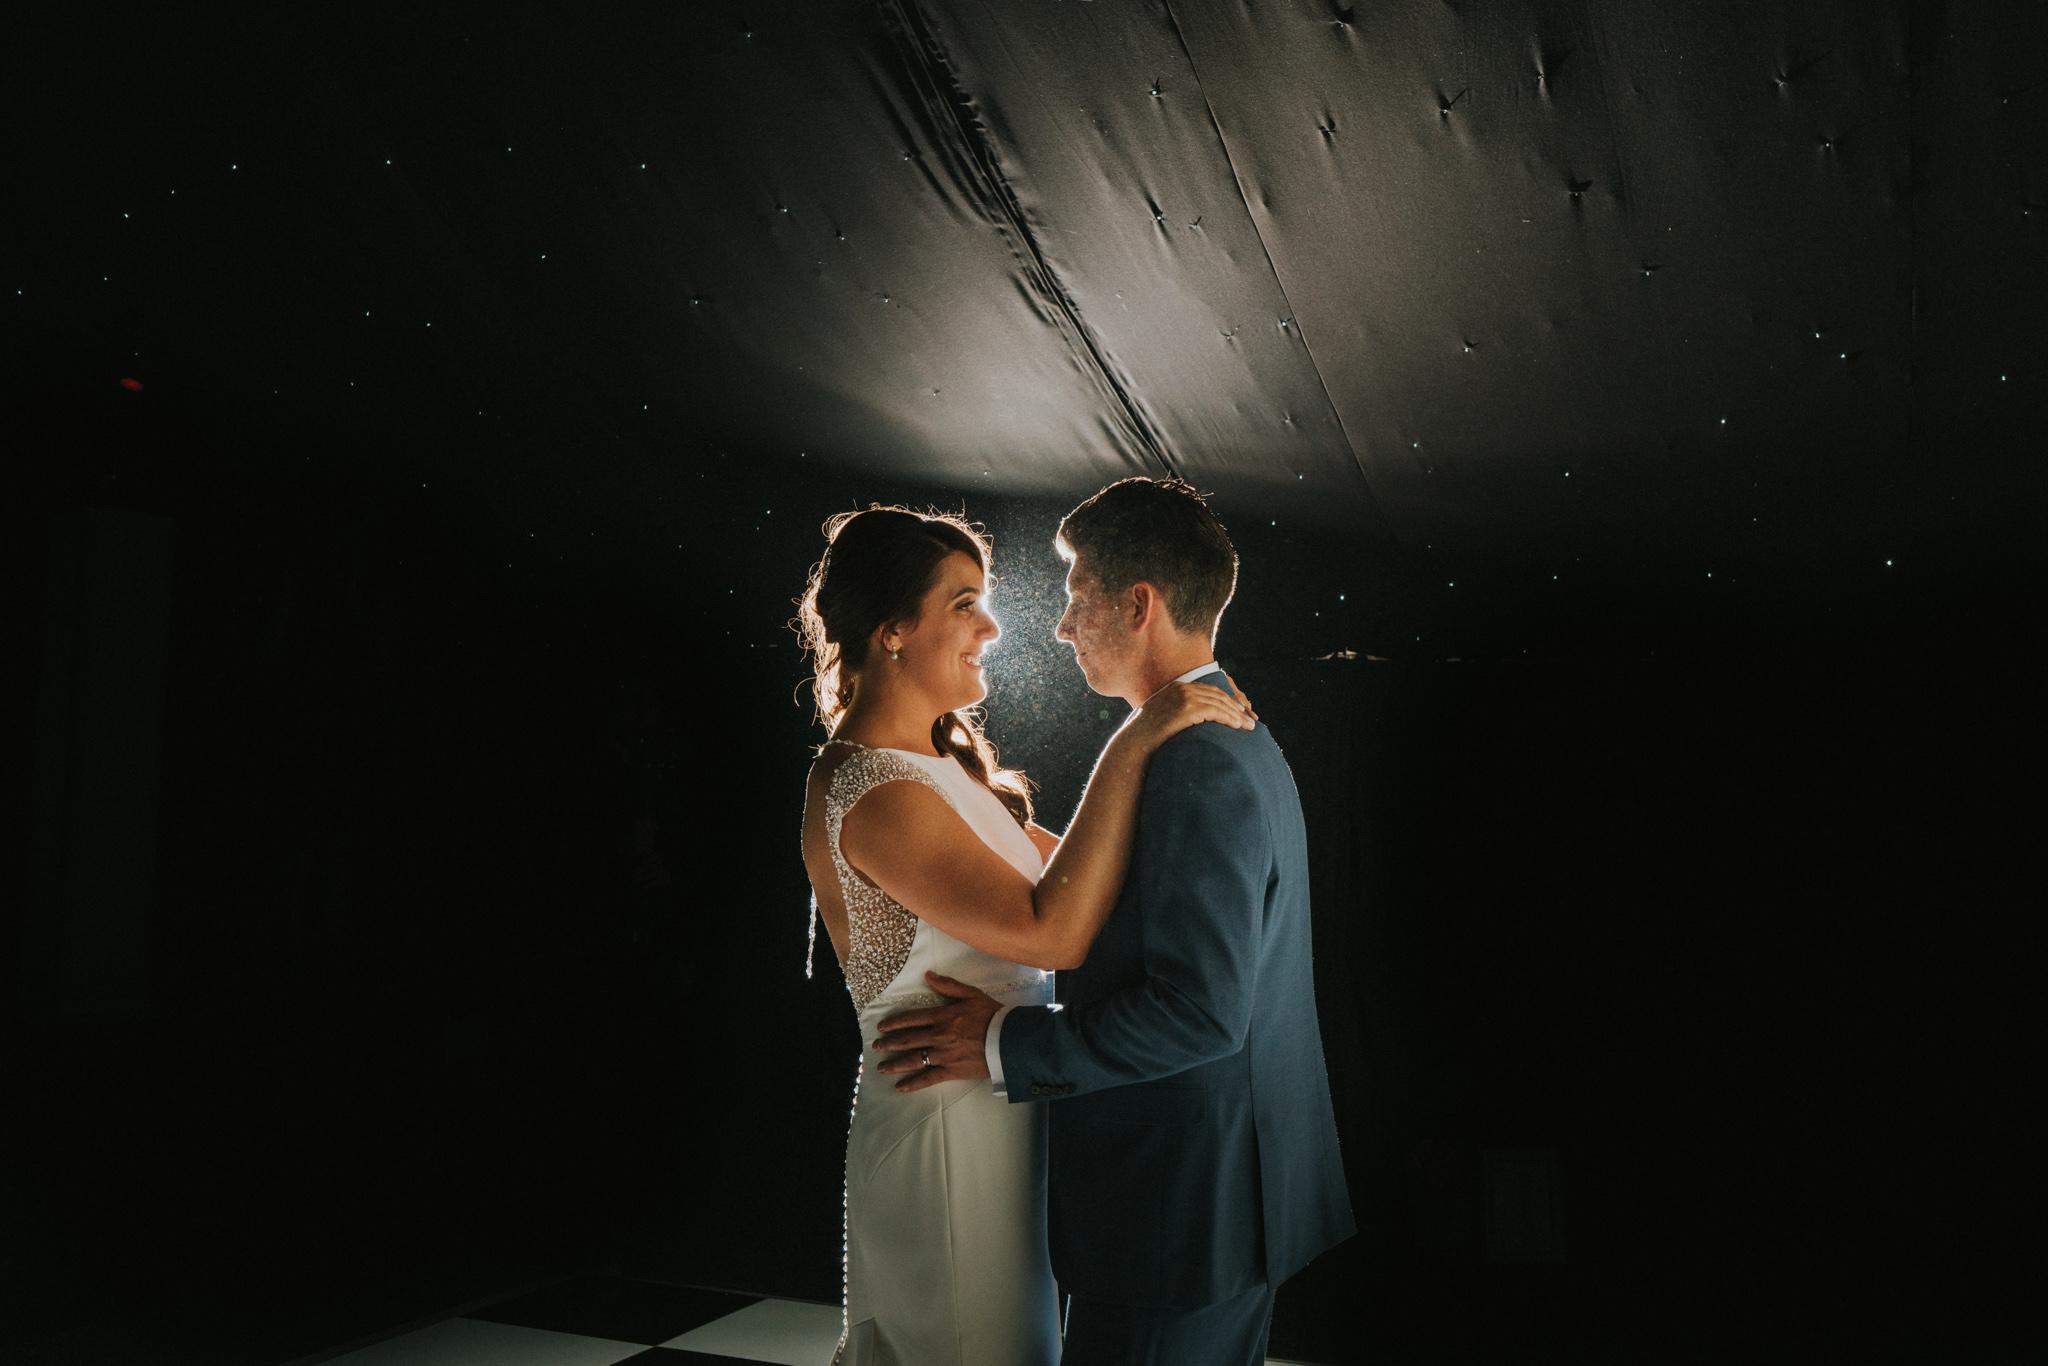 danielle-and-gareths-boho-wedding-previews-at-high-house-weddings-grace-elizabeth-colchester-essex-suffolk-norfolk-devon-alternative-wedding-and-lifestyle-photographer (73 of 76).jpg